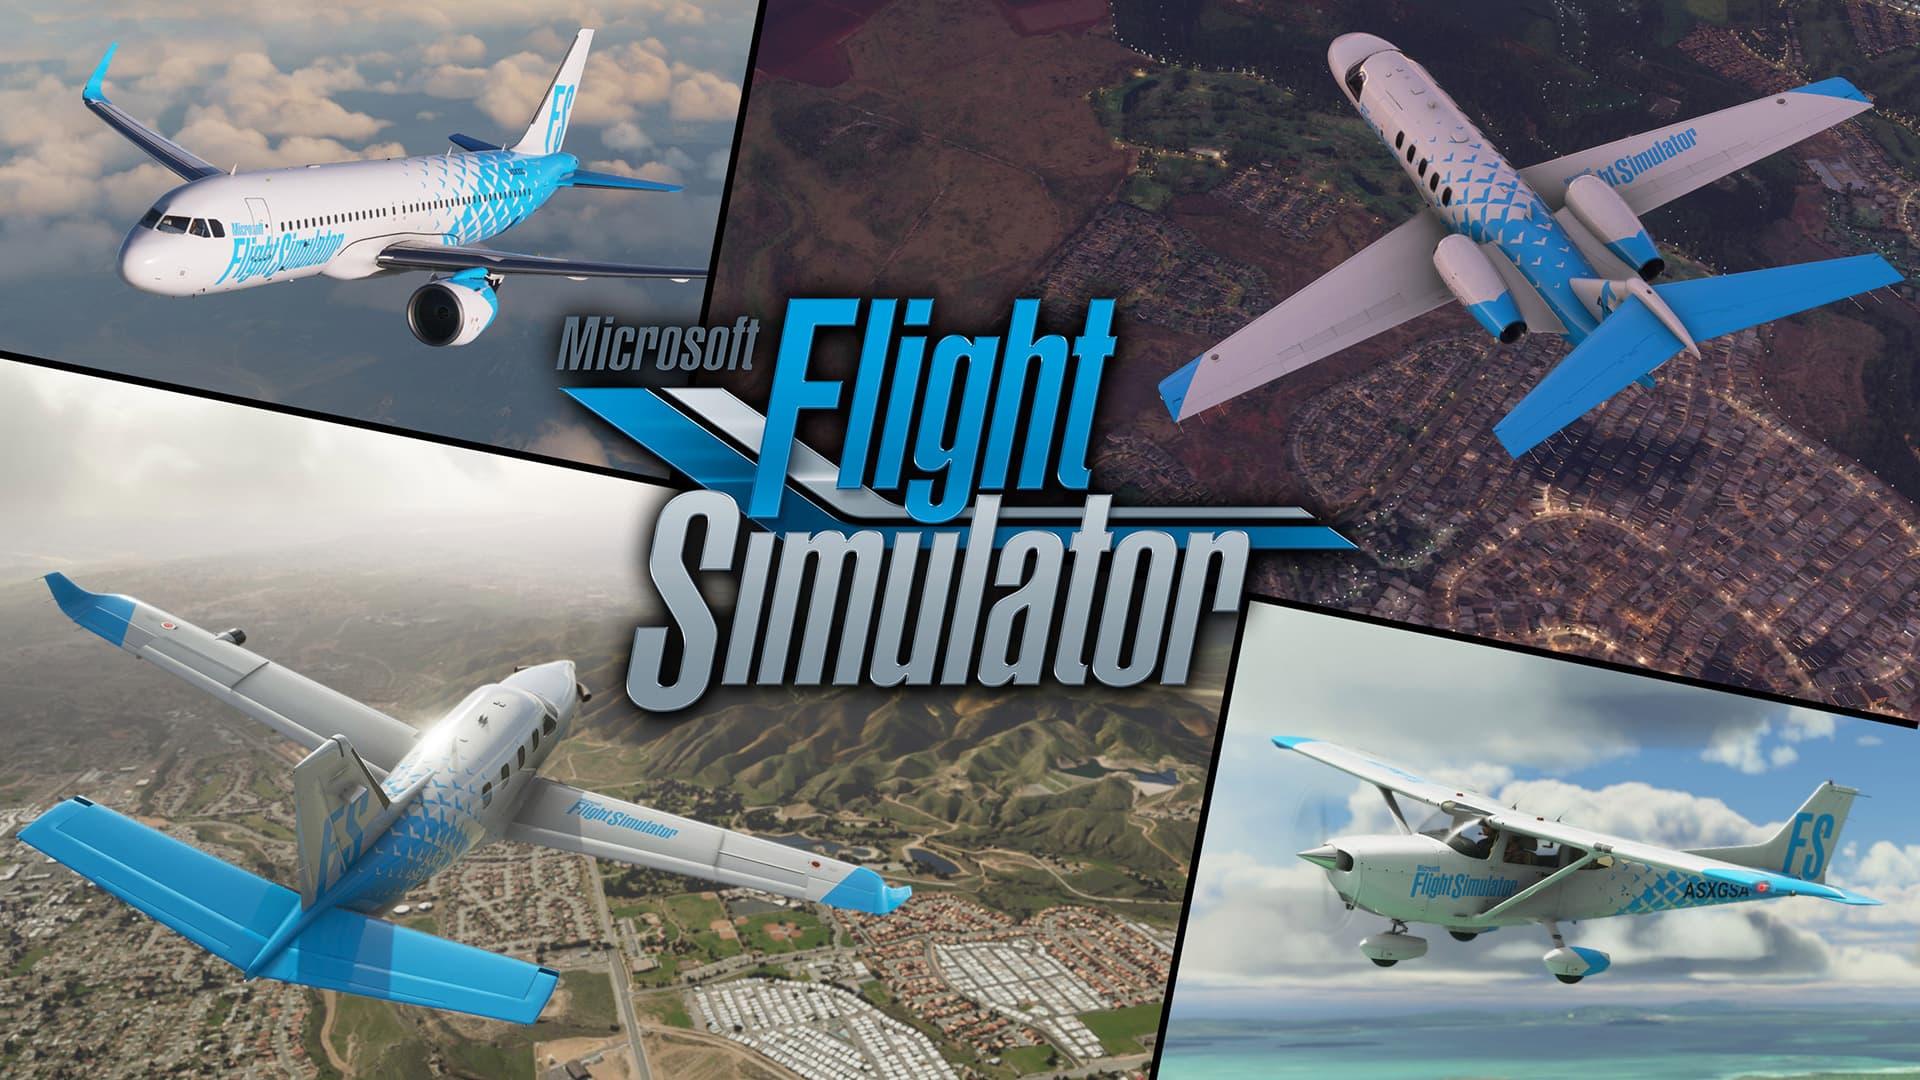 Microsoft Flight Simulator 2020 finally gets support for VR